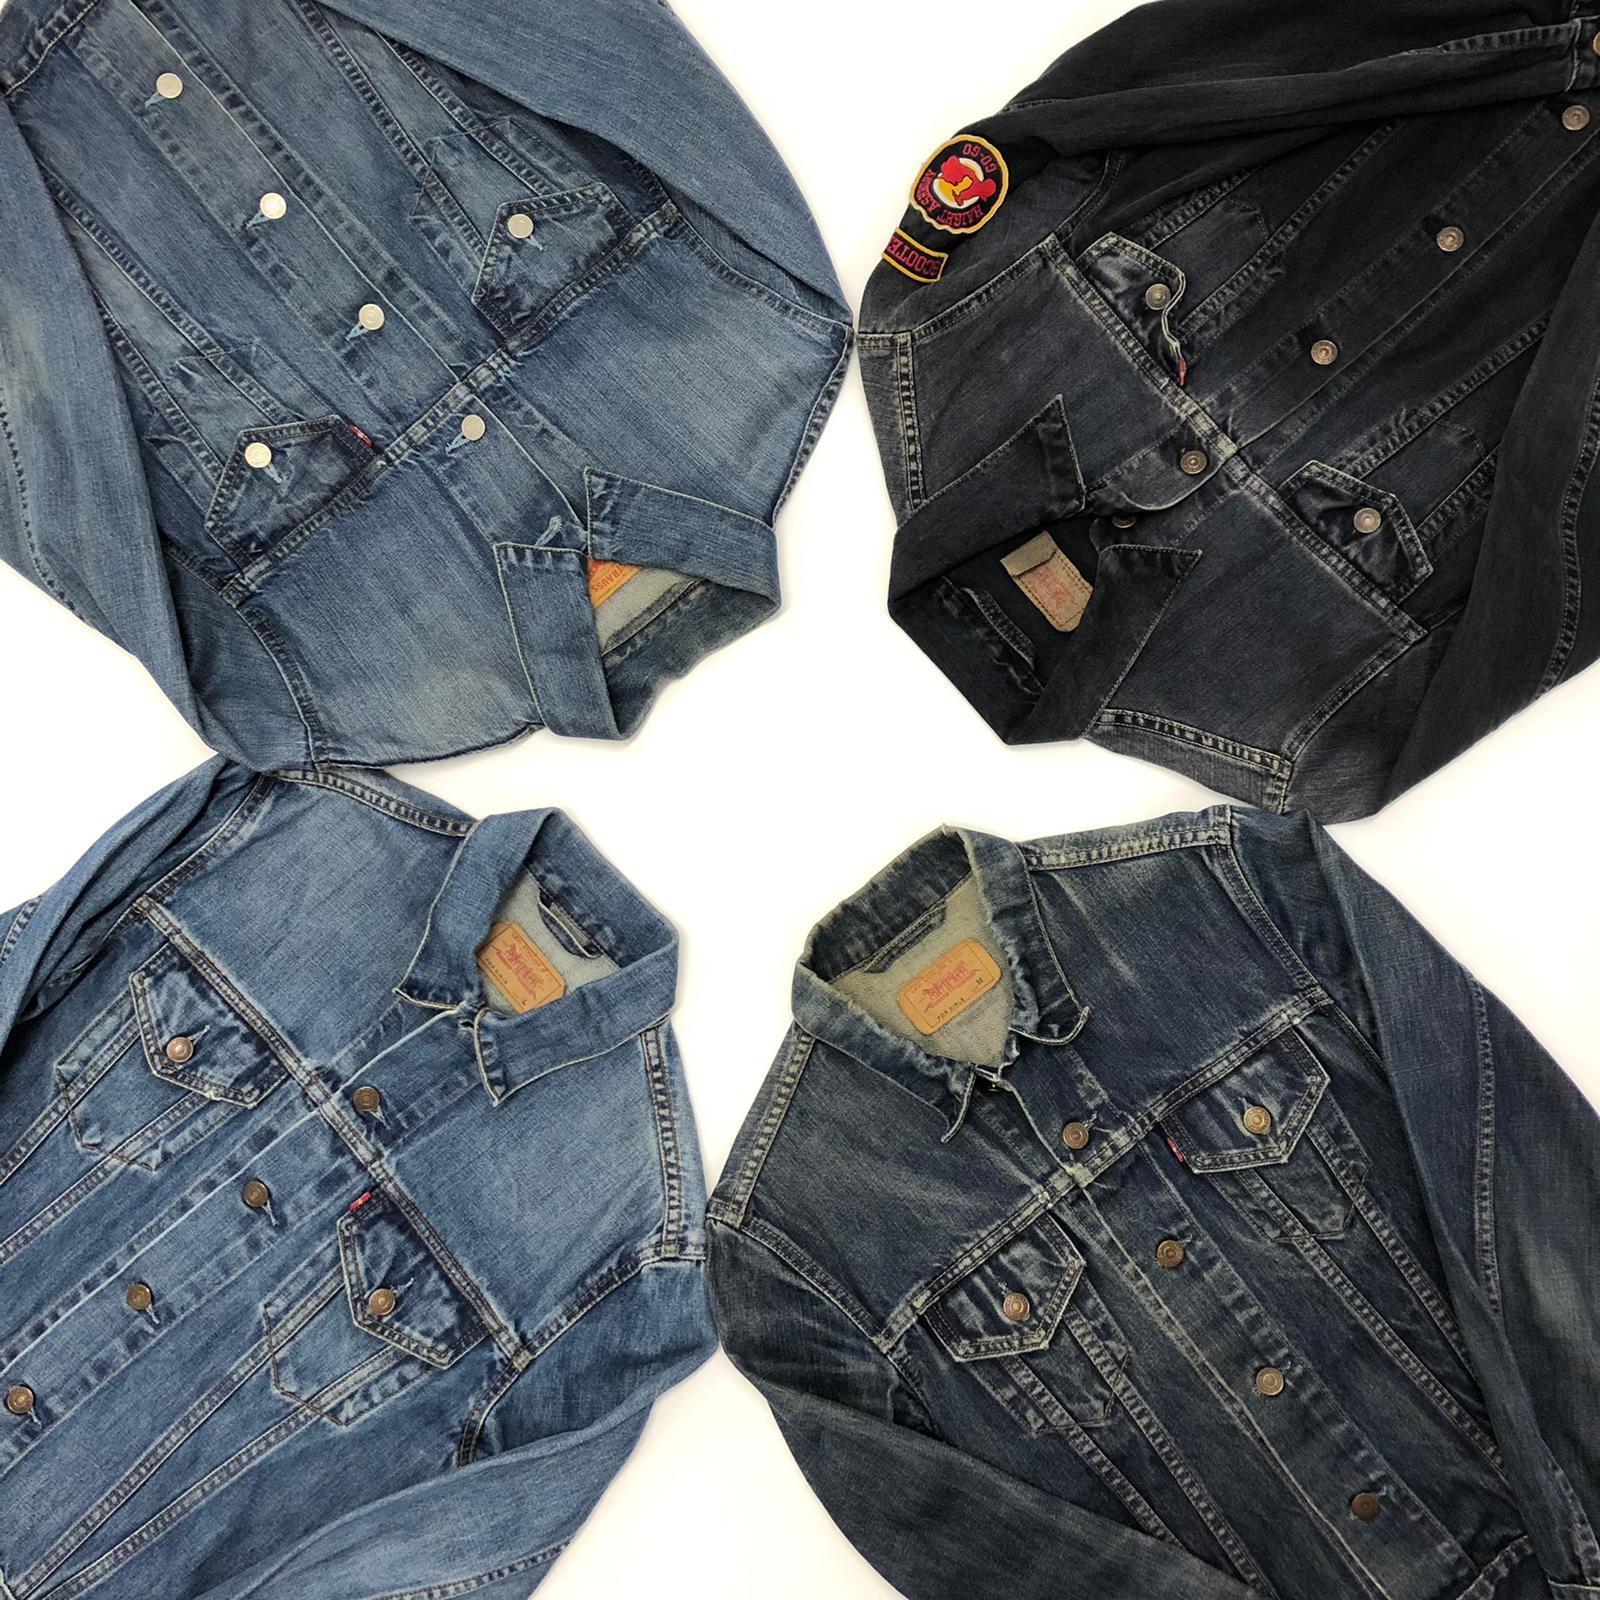 Vintage Levis Lee Wrangler Denim Jacket Mix PER KILO